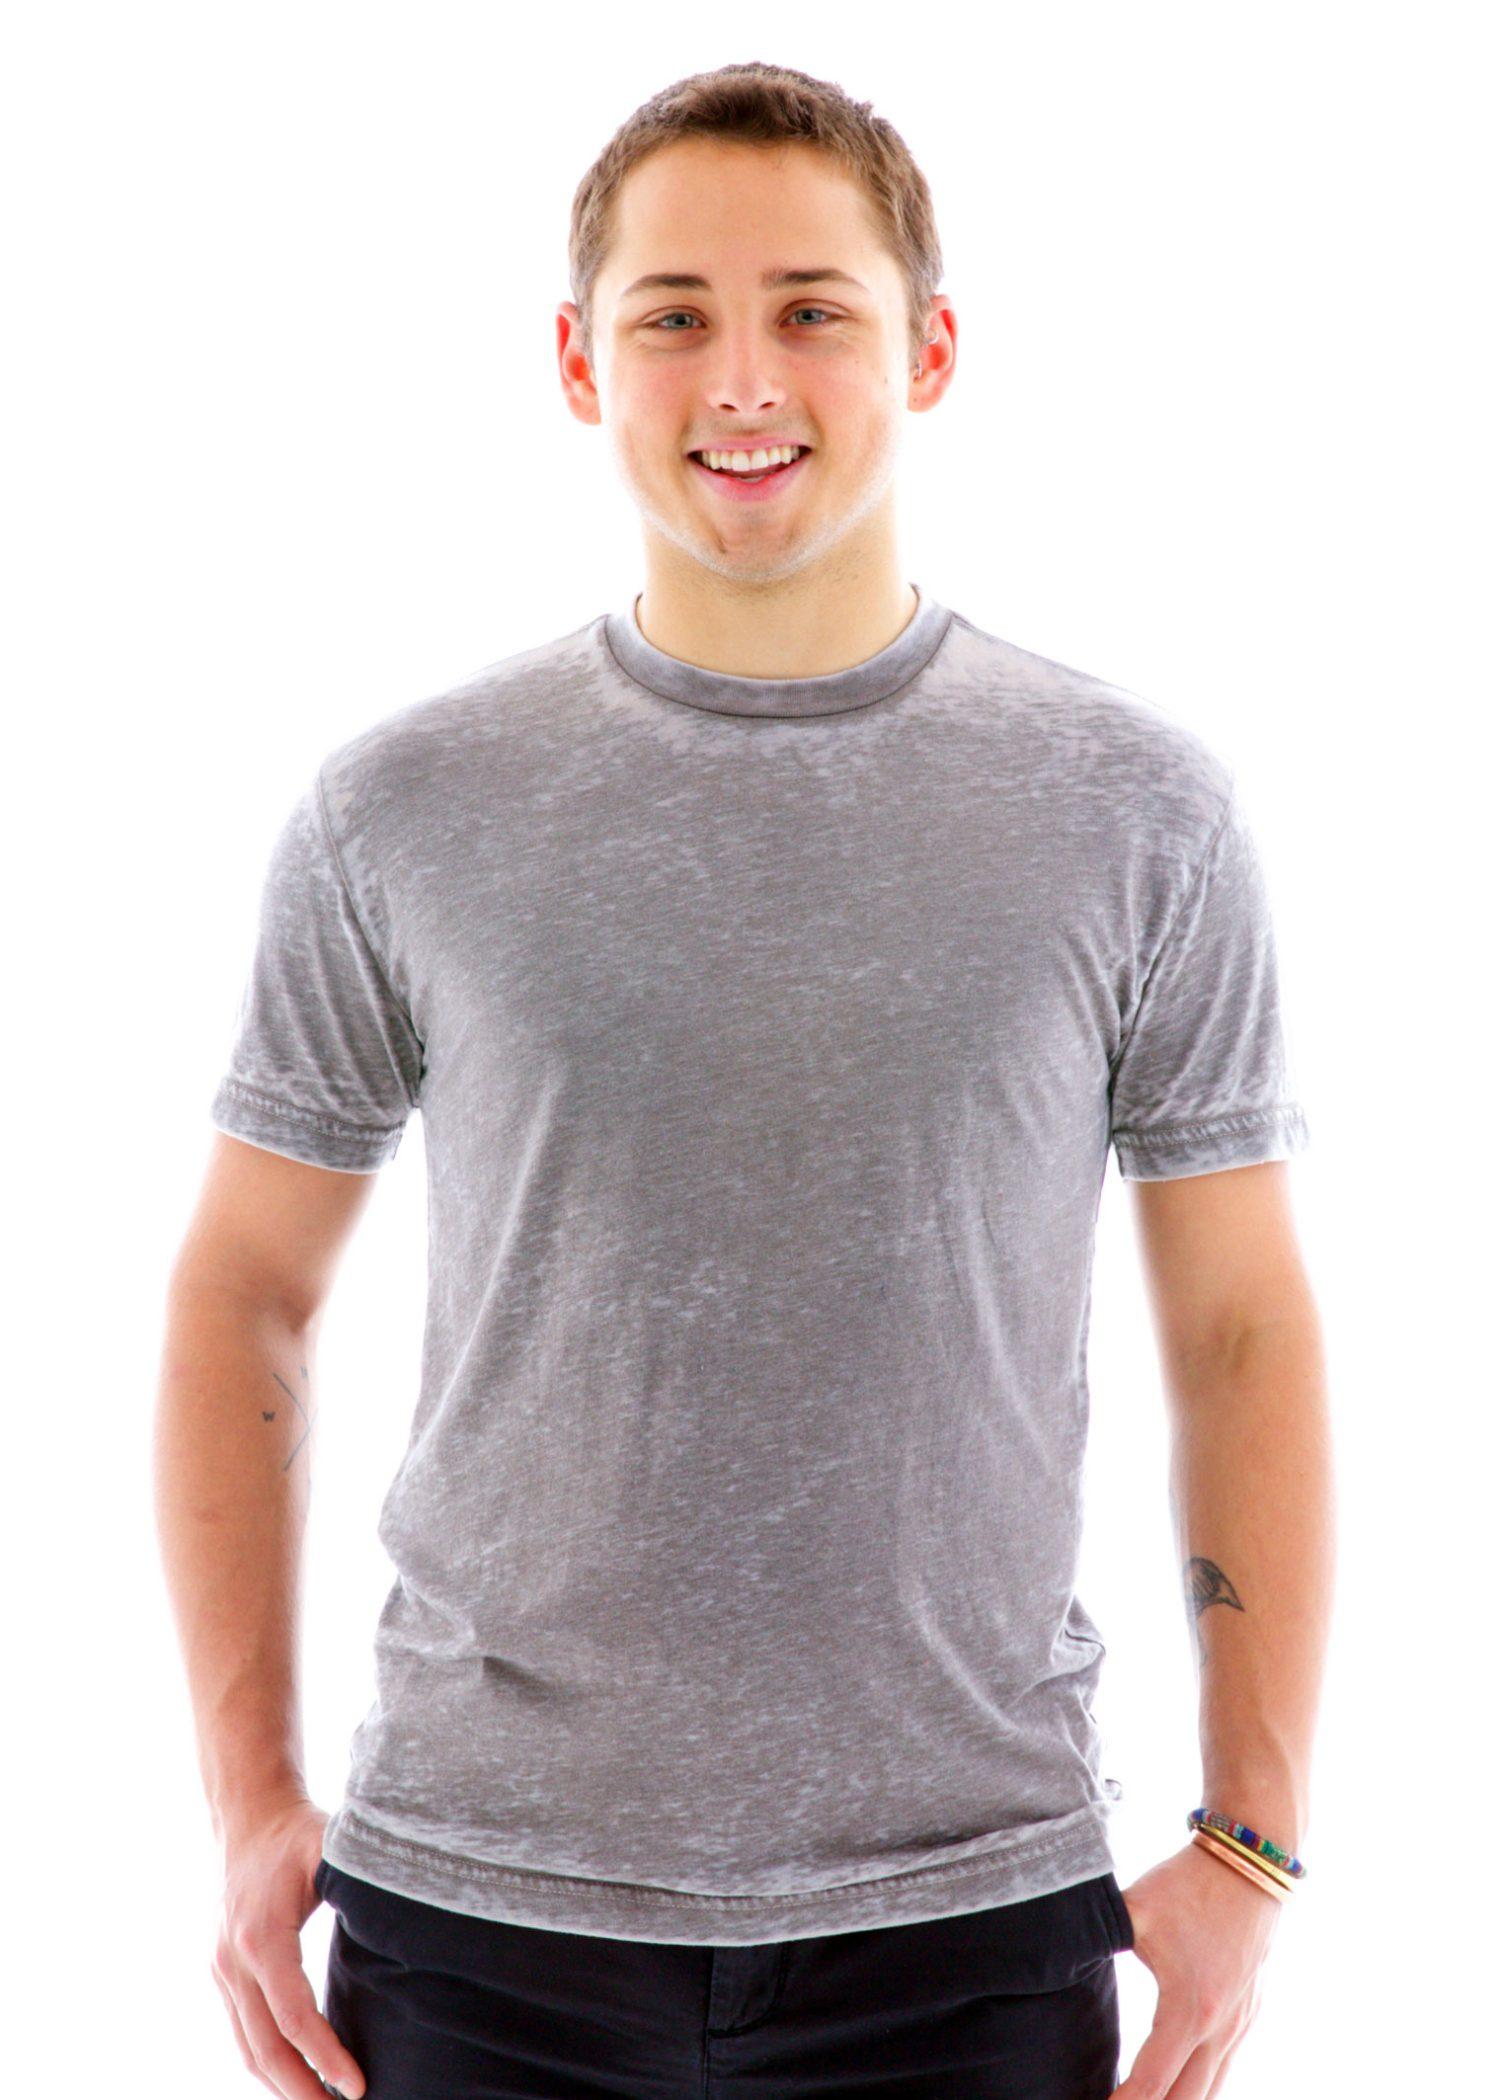 Burnout Crew Short Sleeve T-Shirt Front View